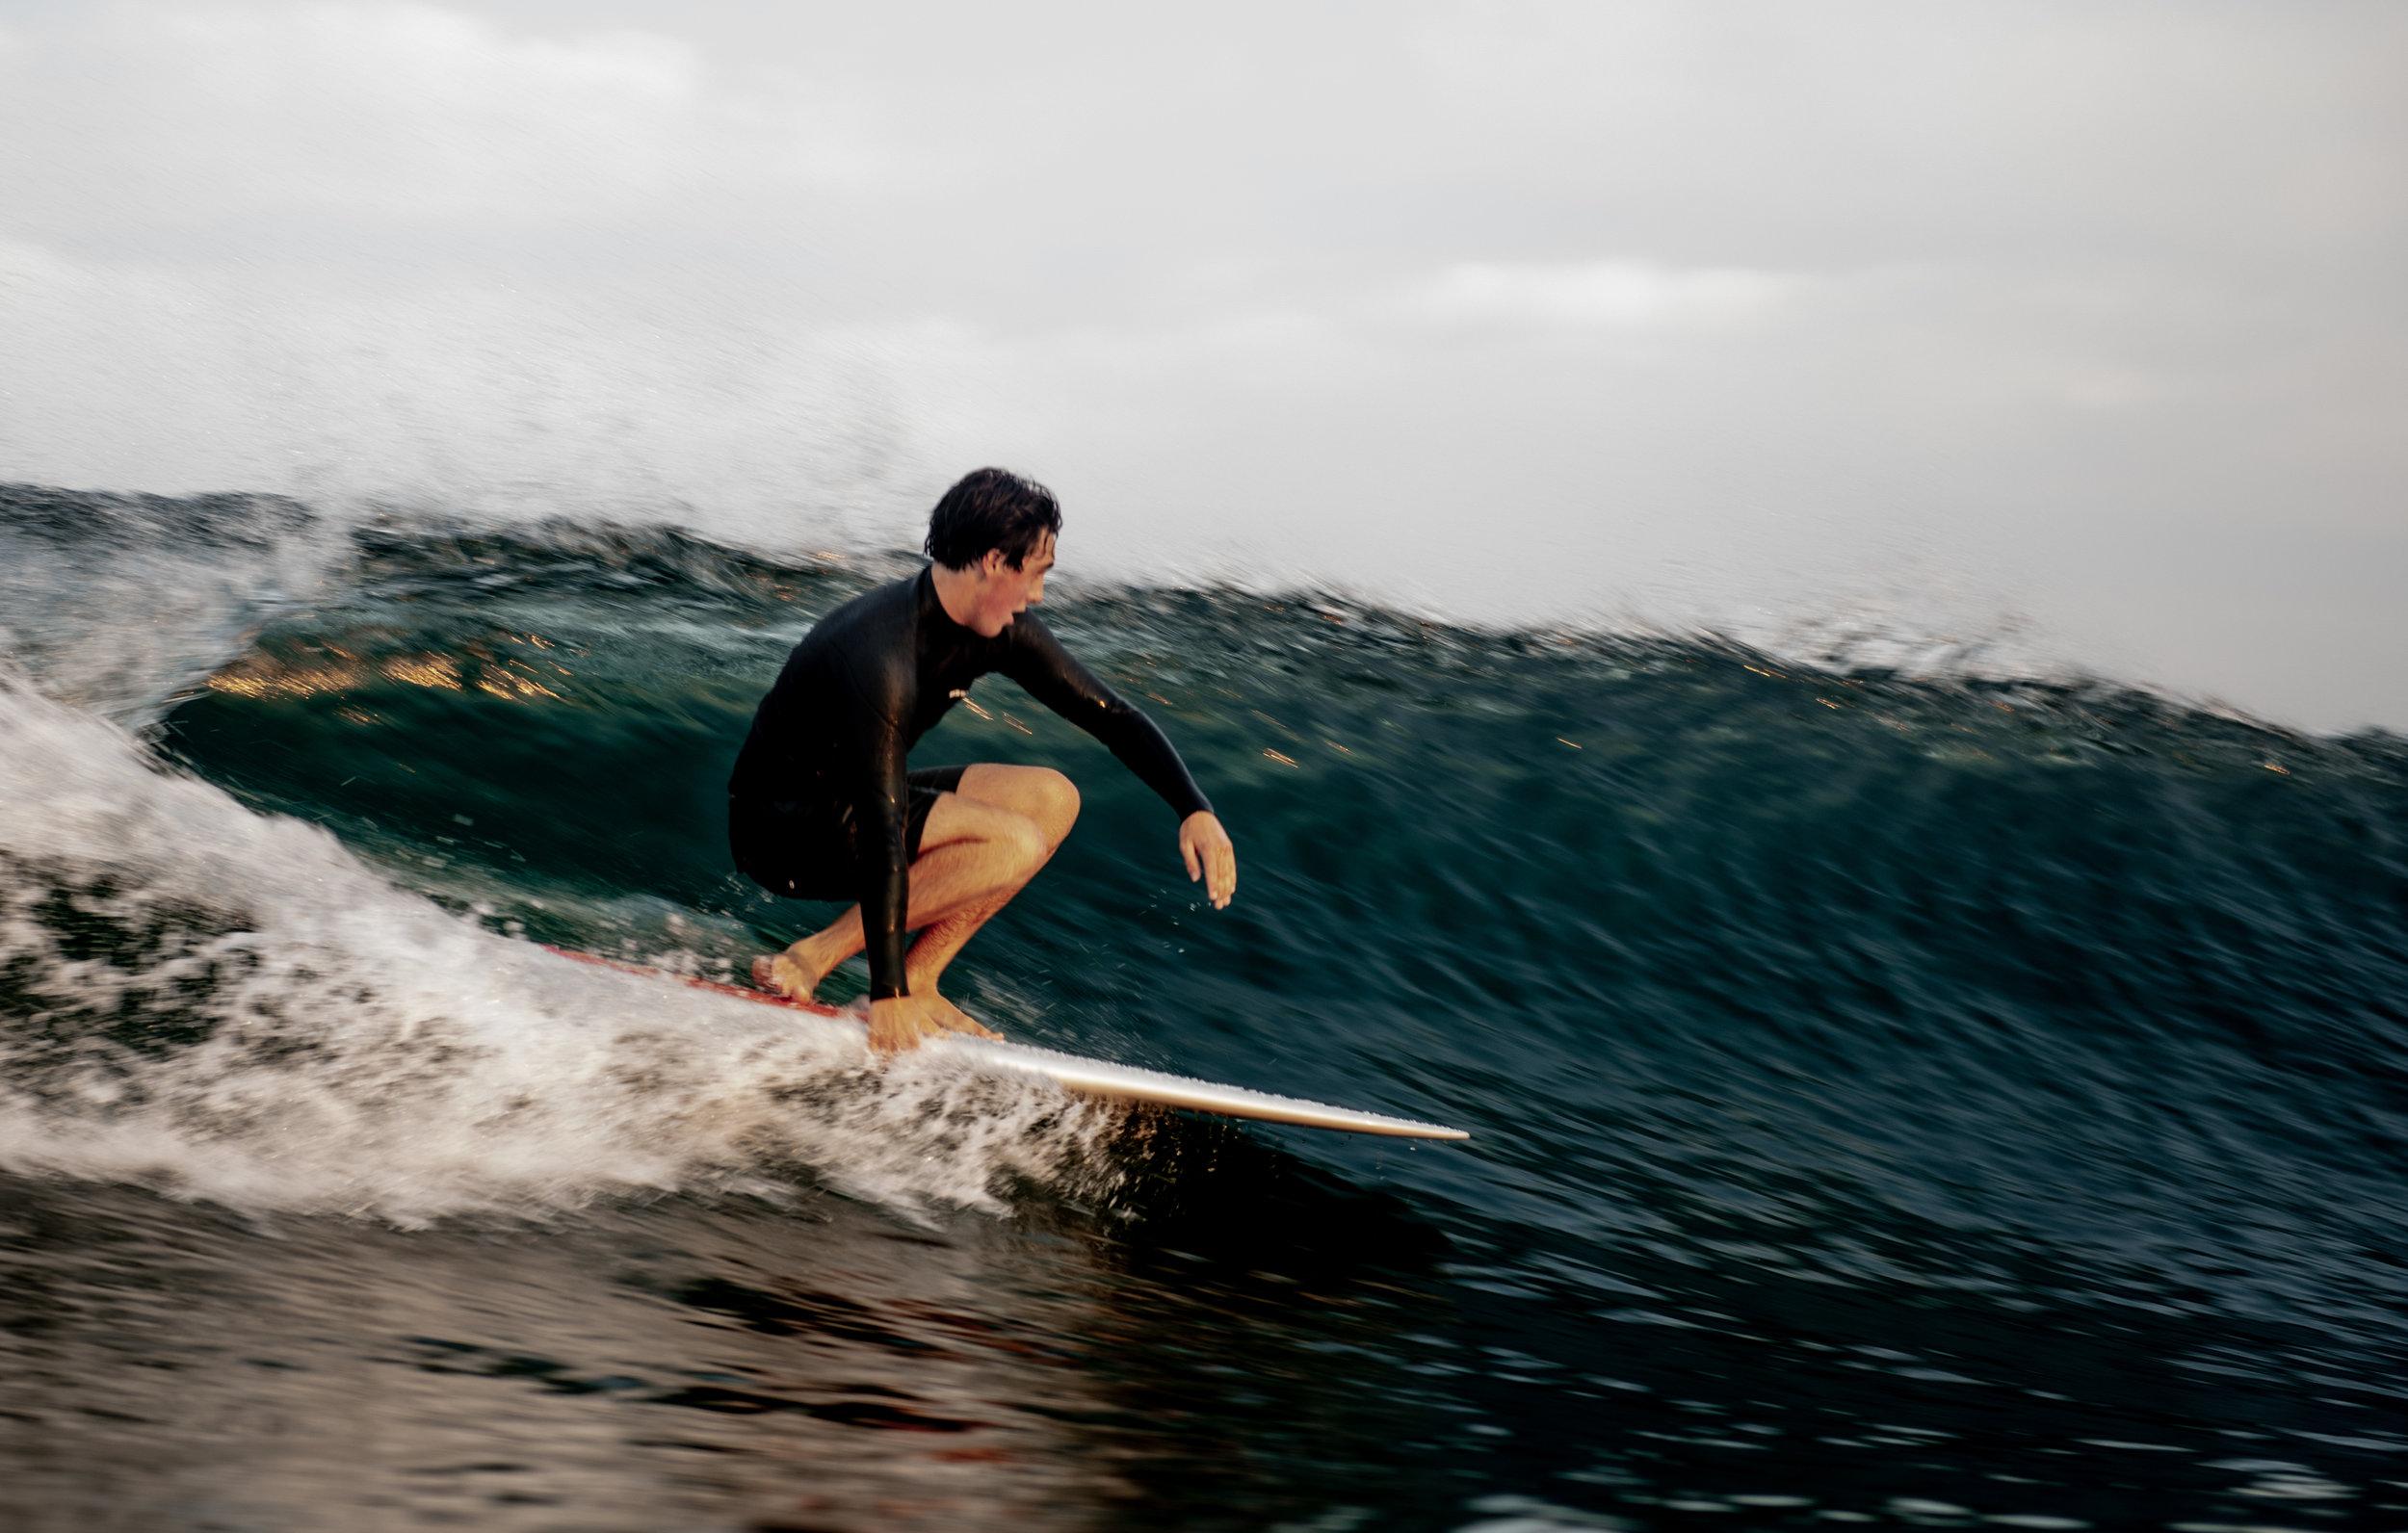 SURF_NOAHS_BBRADLEY-1.jpg